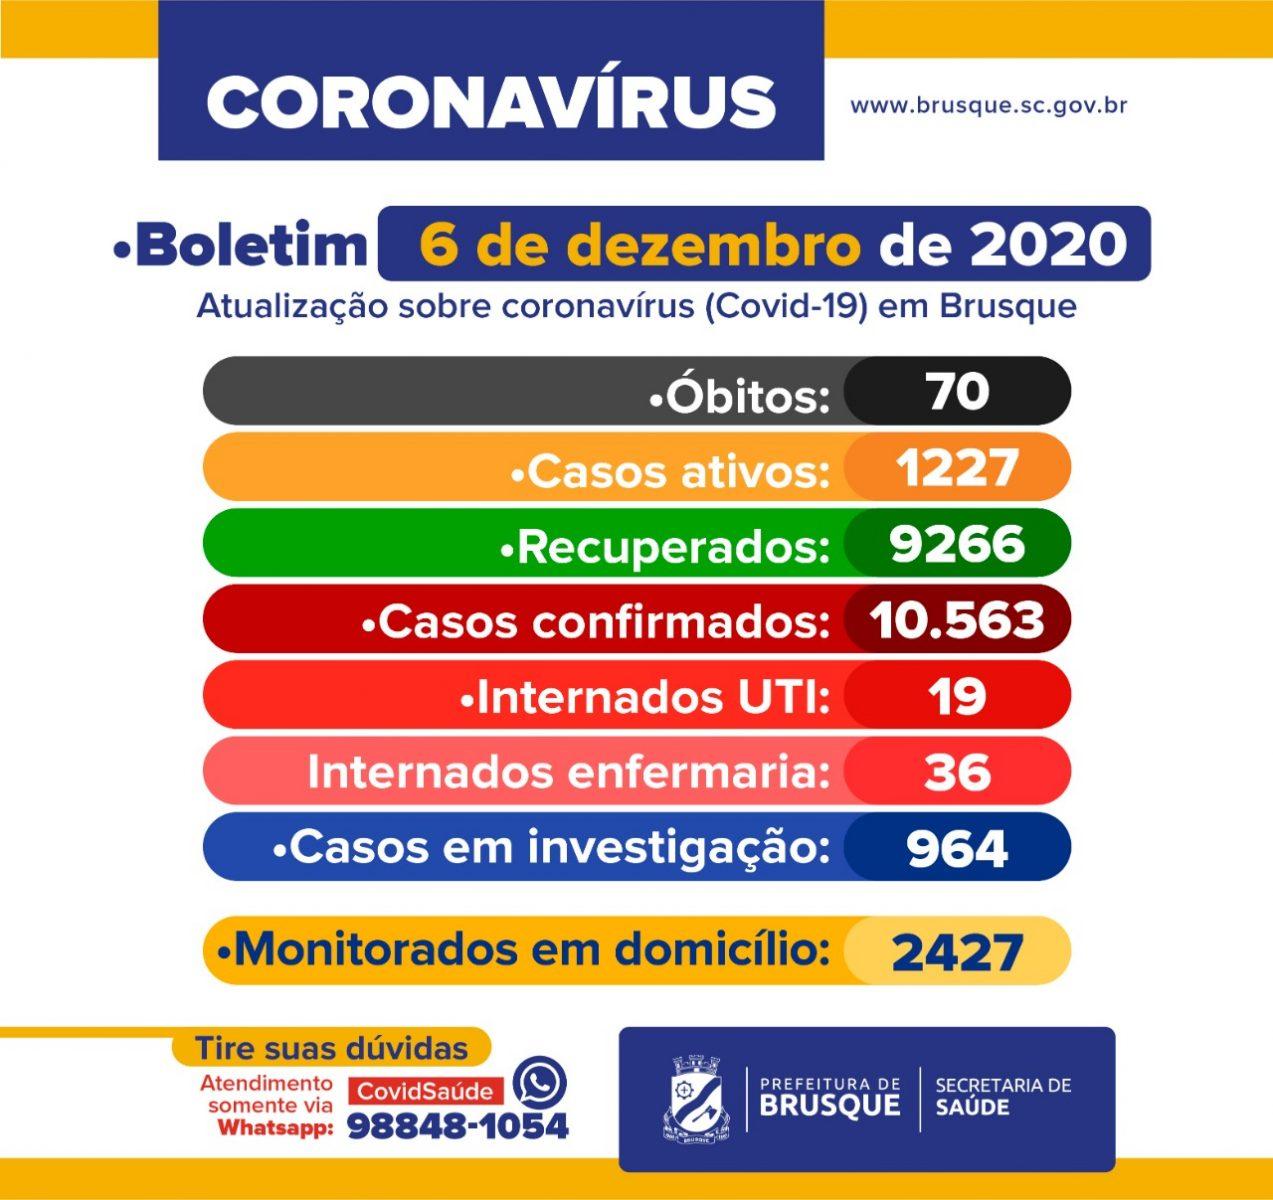 Covid-19: Boletim epidemiológico de 6 de dezembro